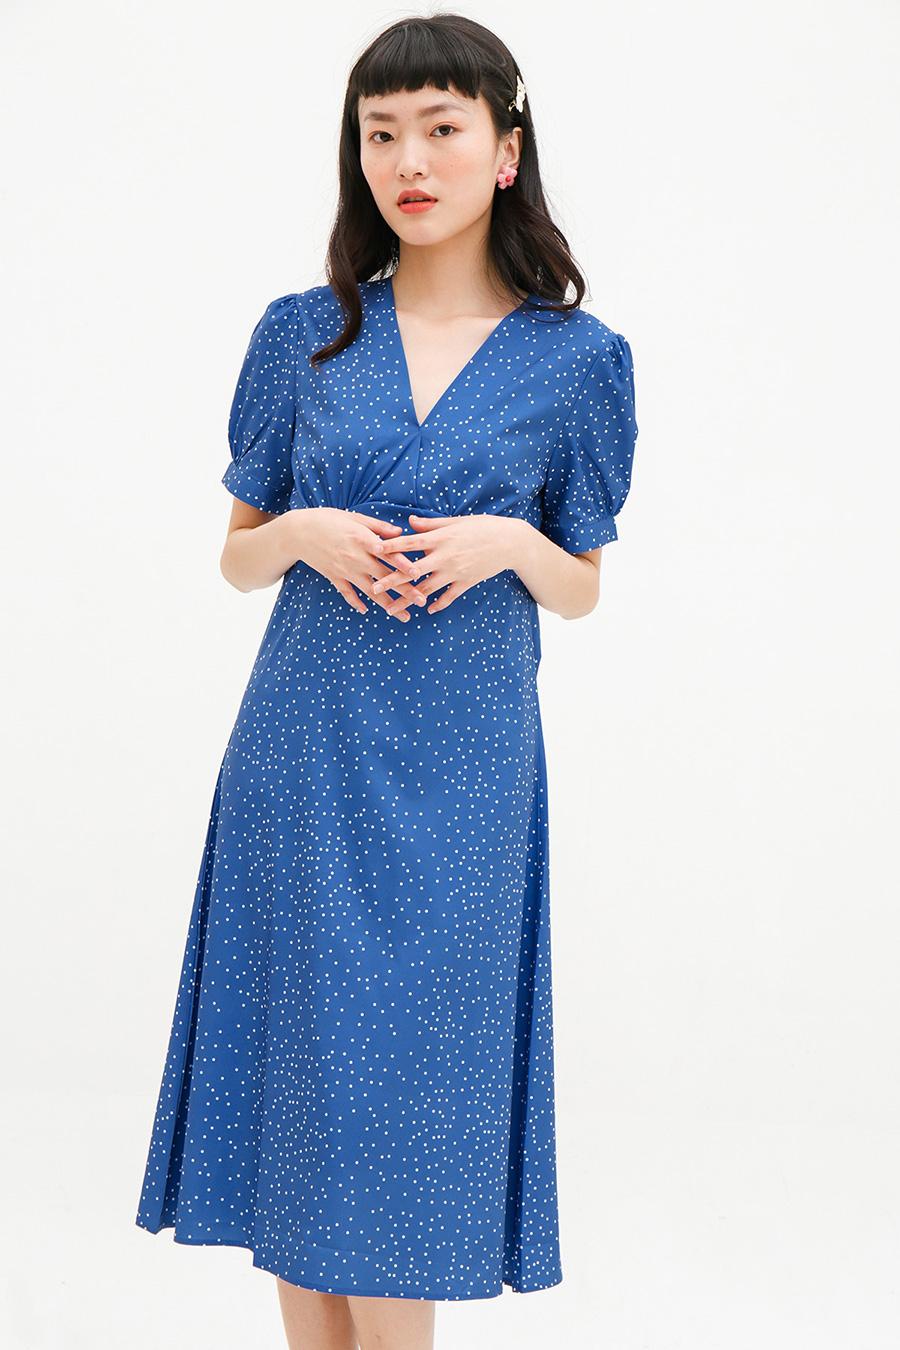 PELETIER DRESS - ROYAL DOTTY